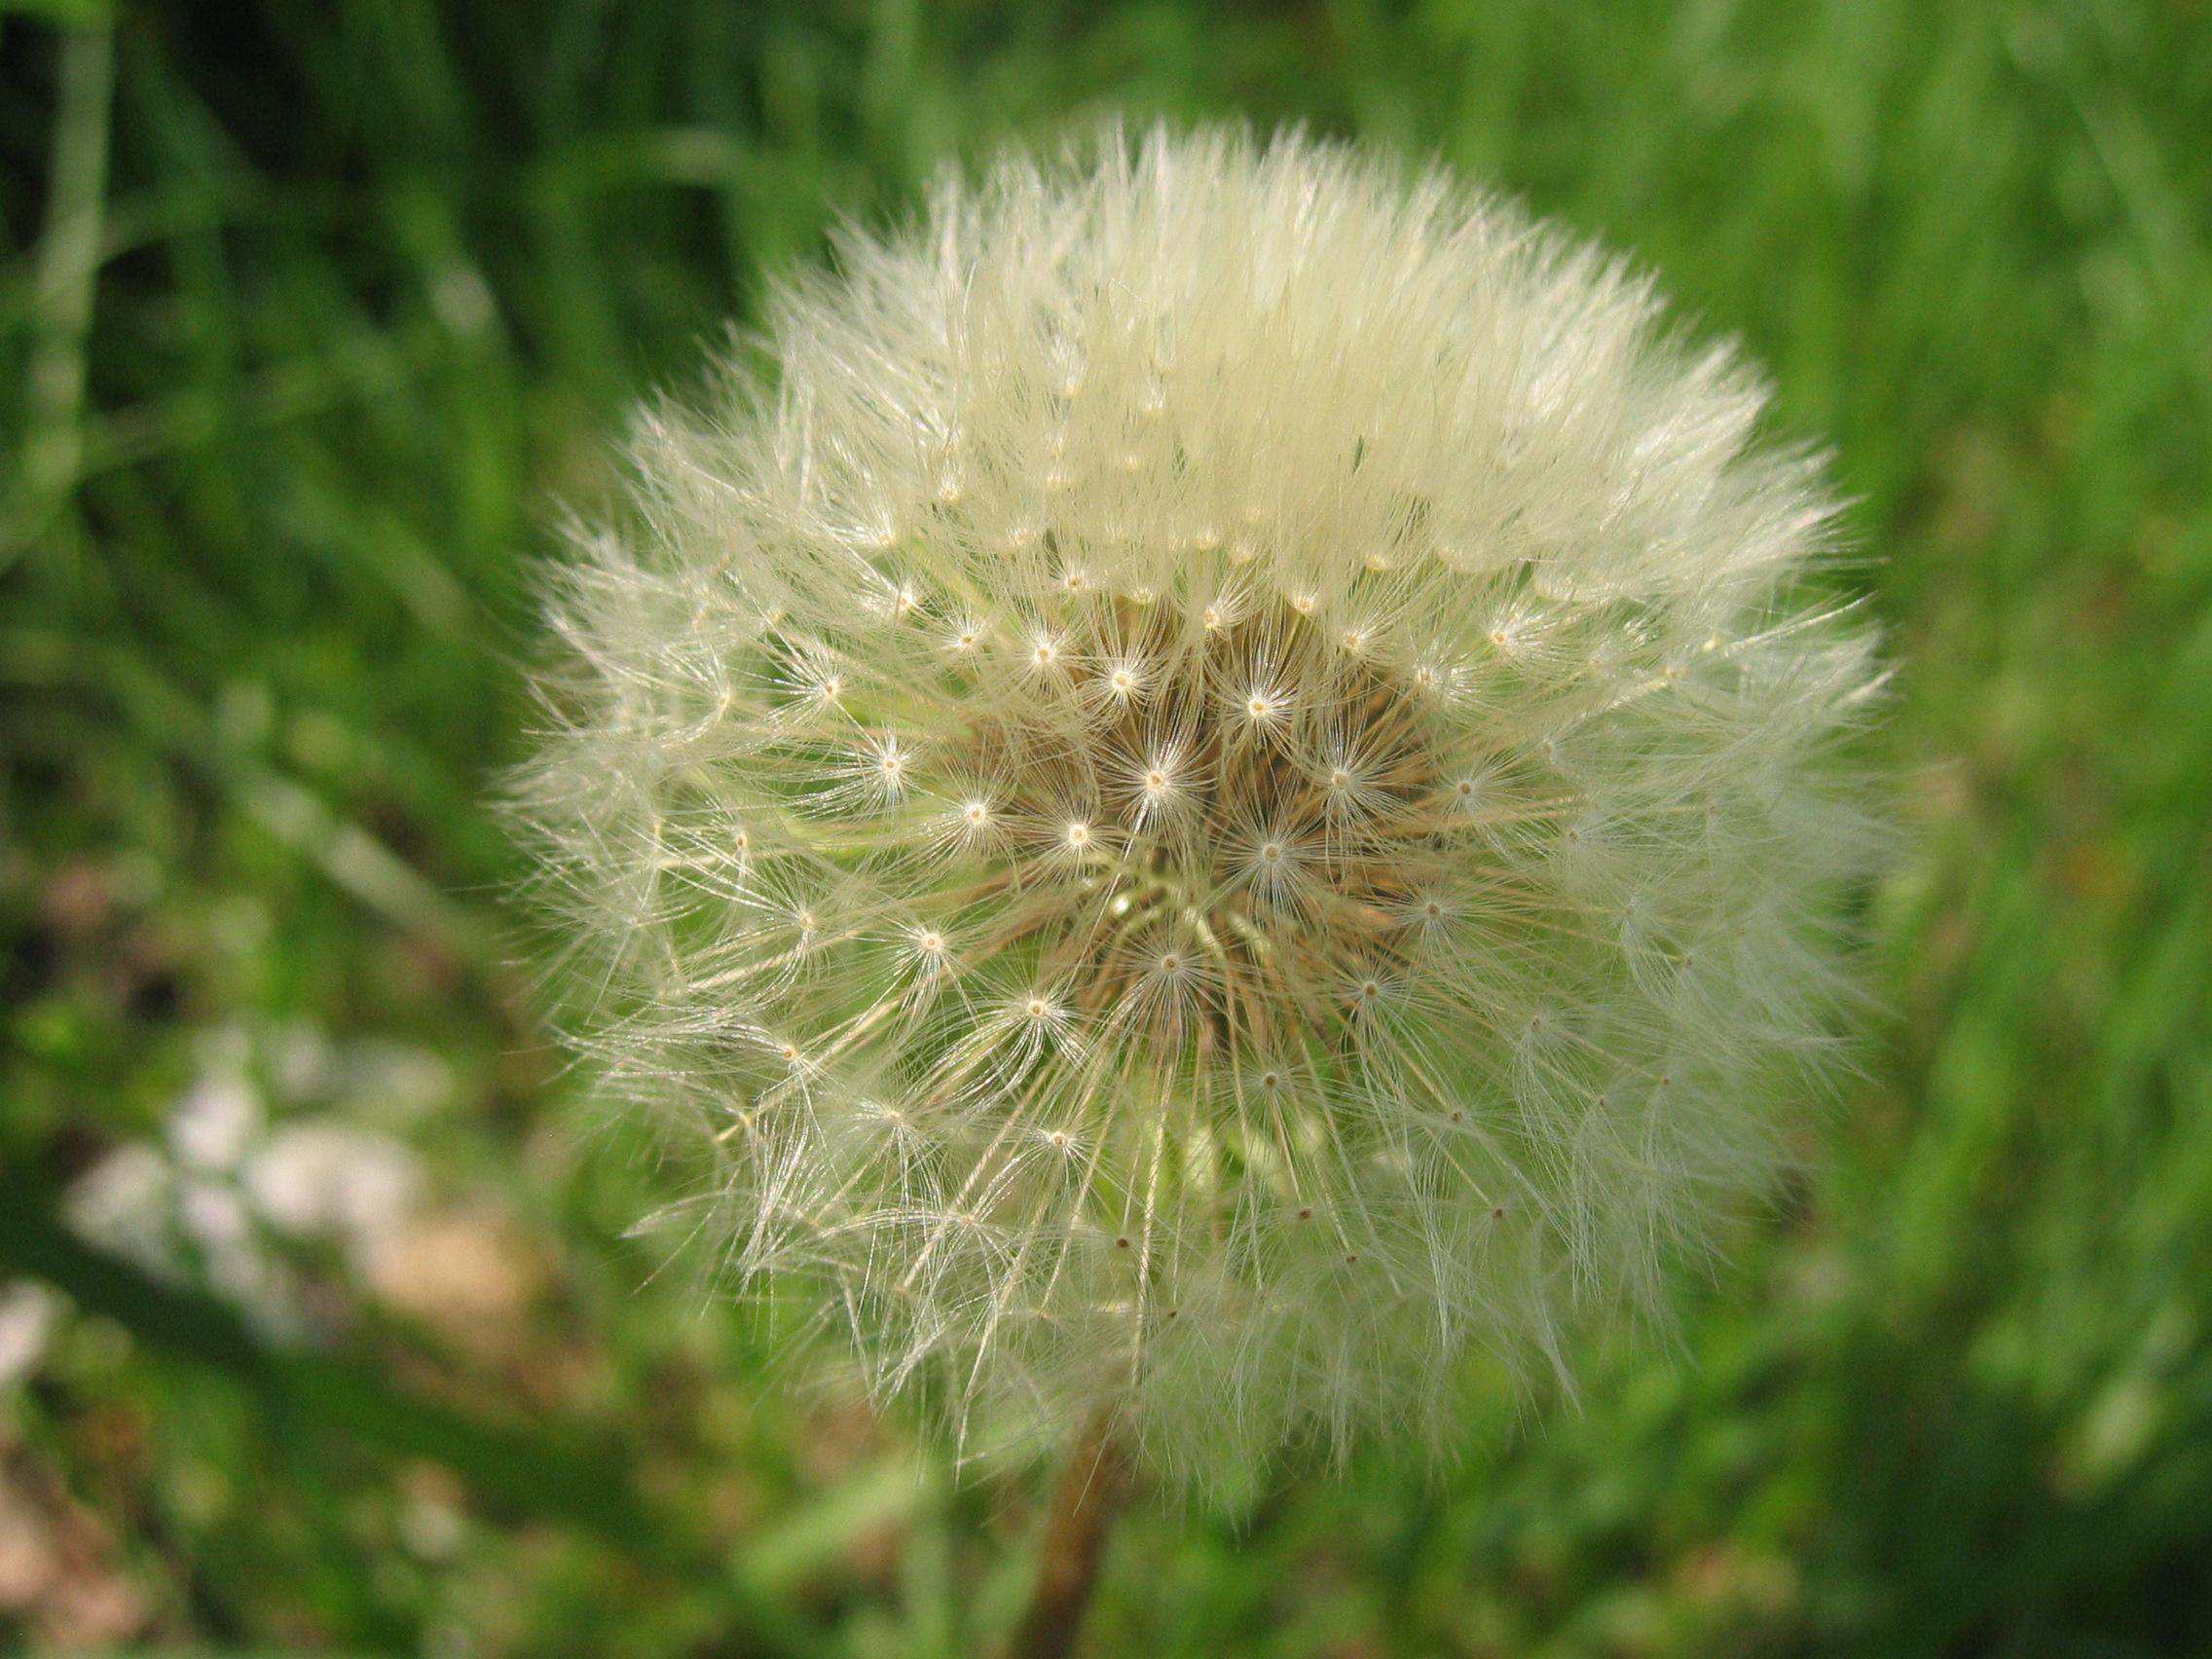 Dandelion seed head, a thing of wonder